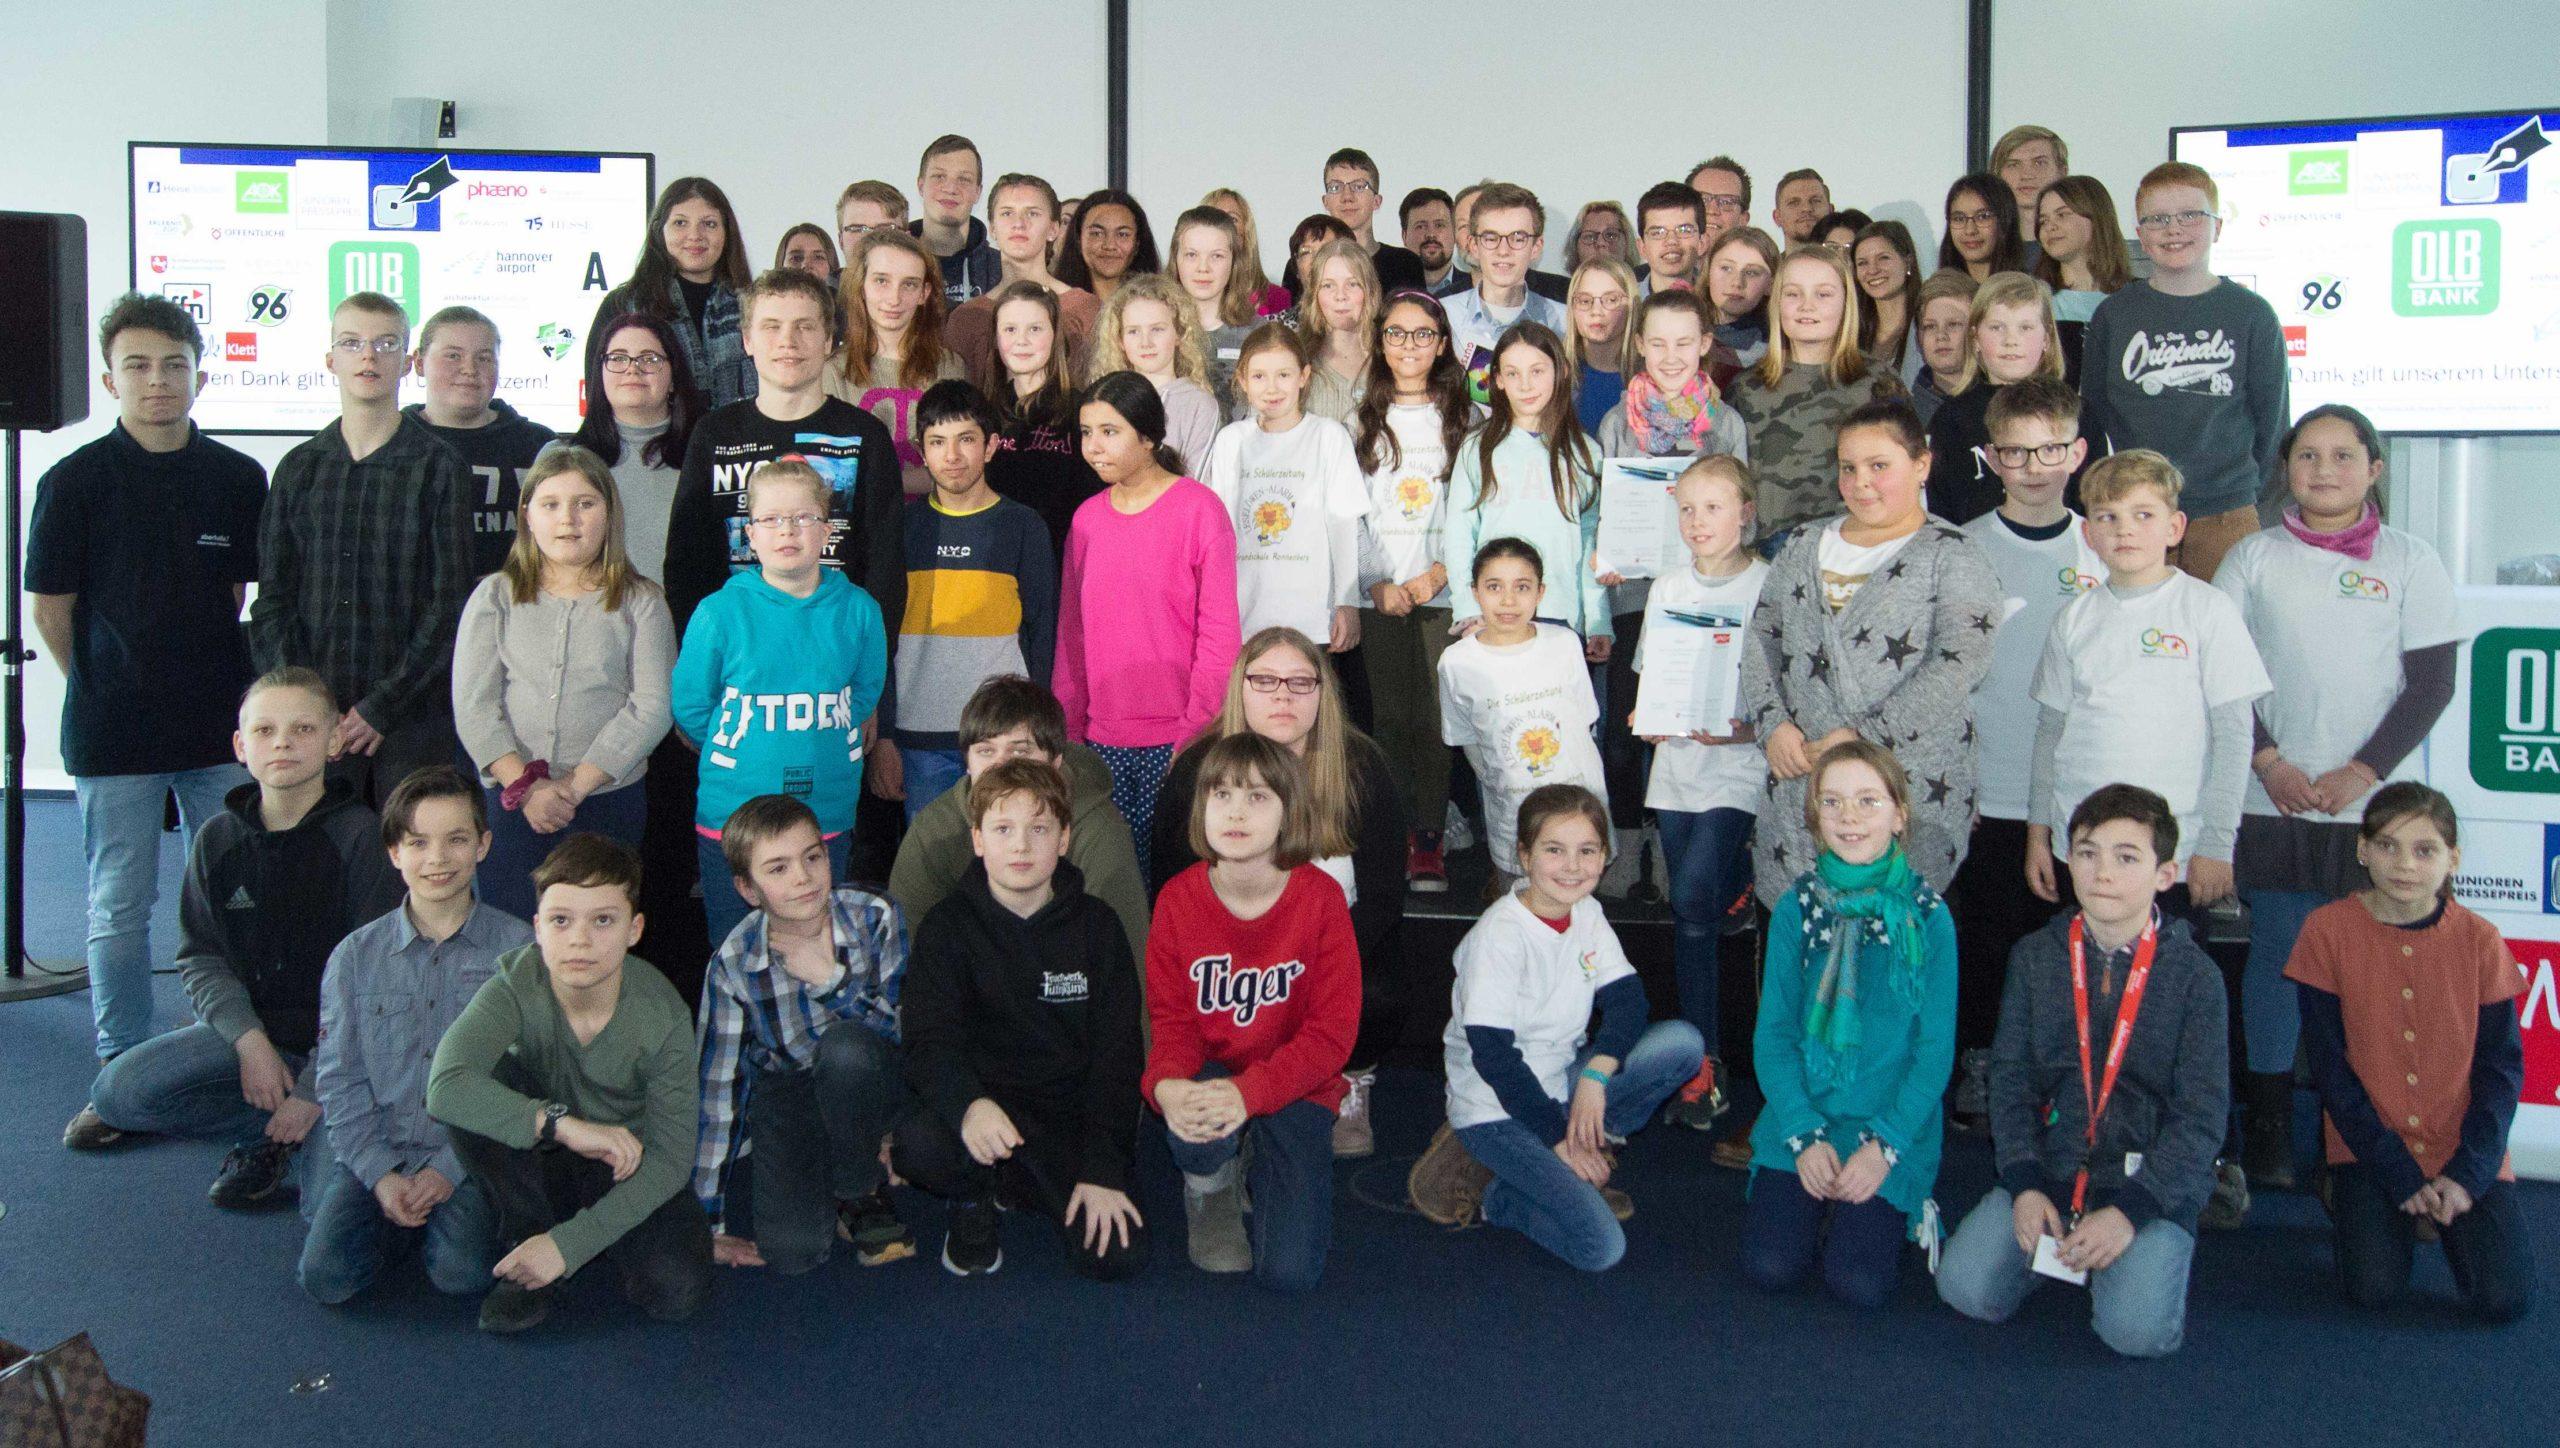 Alle Teilnehmer an der Preisverleihung 2020